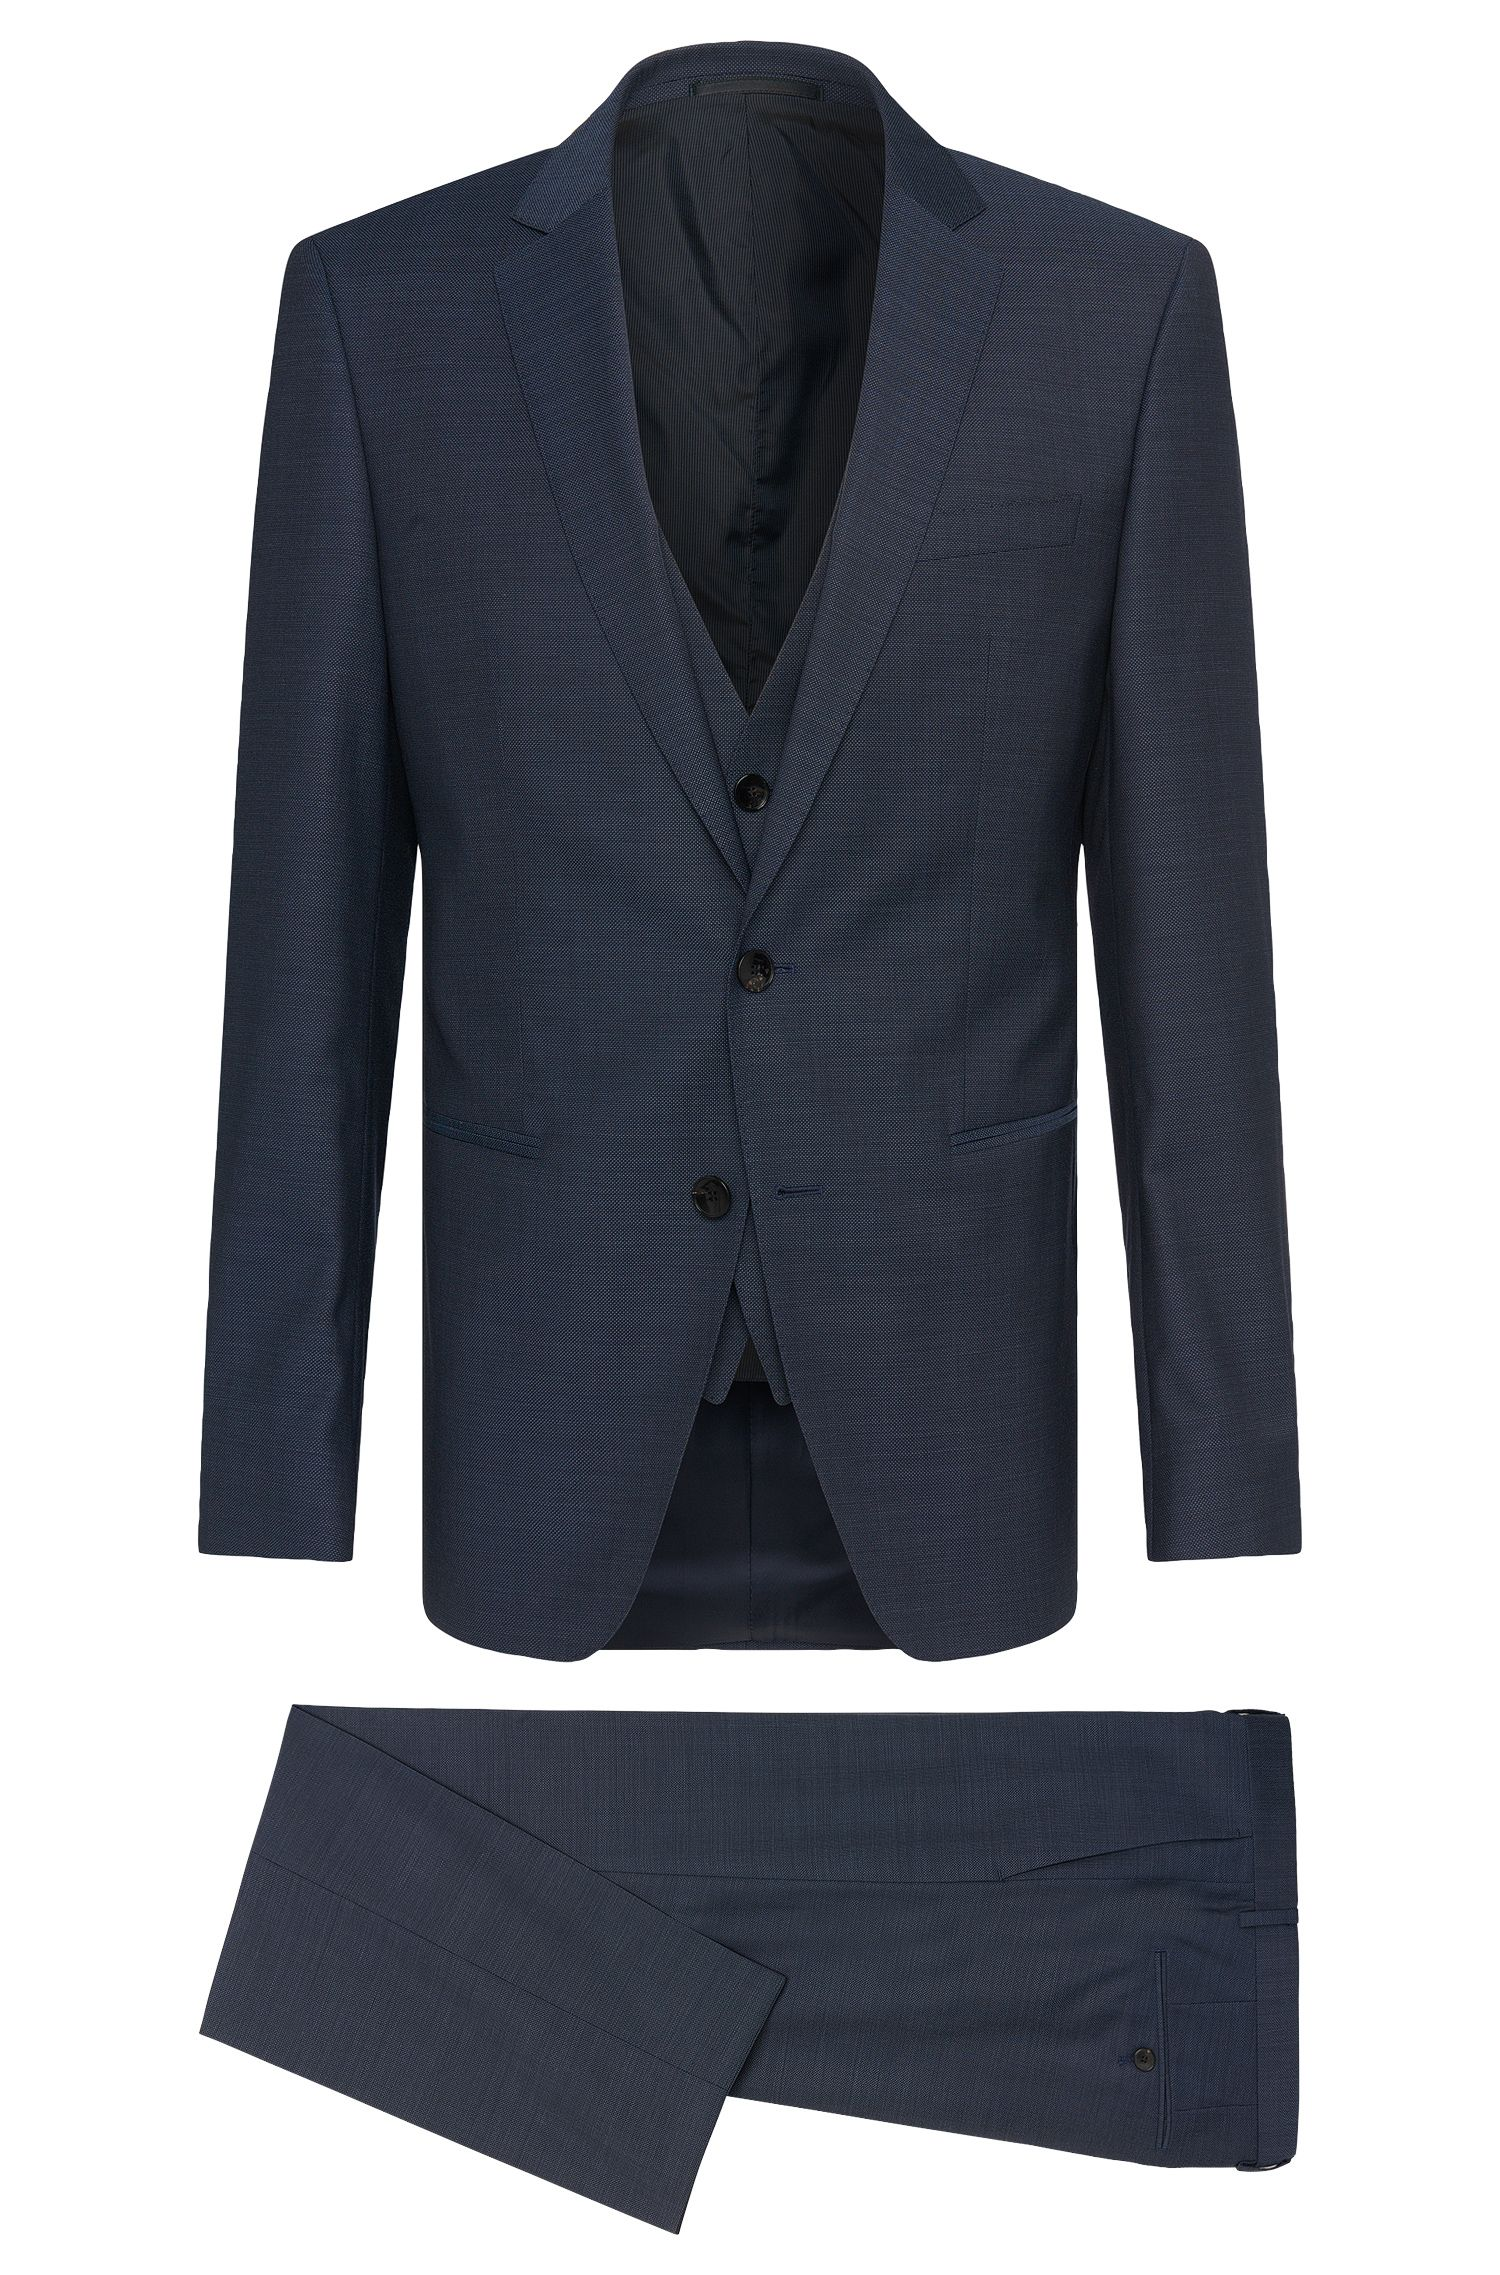 'Hamsen/Glen WE'   Slim Fit, Sharkskin Italian Super 130 Virgin Wool 3-Piece Suit